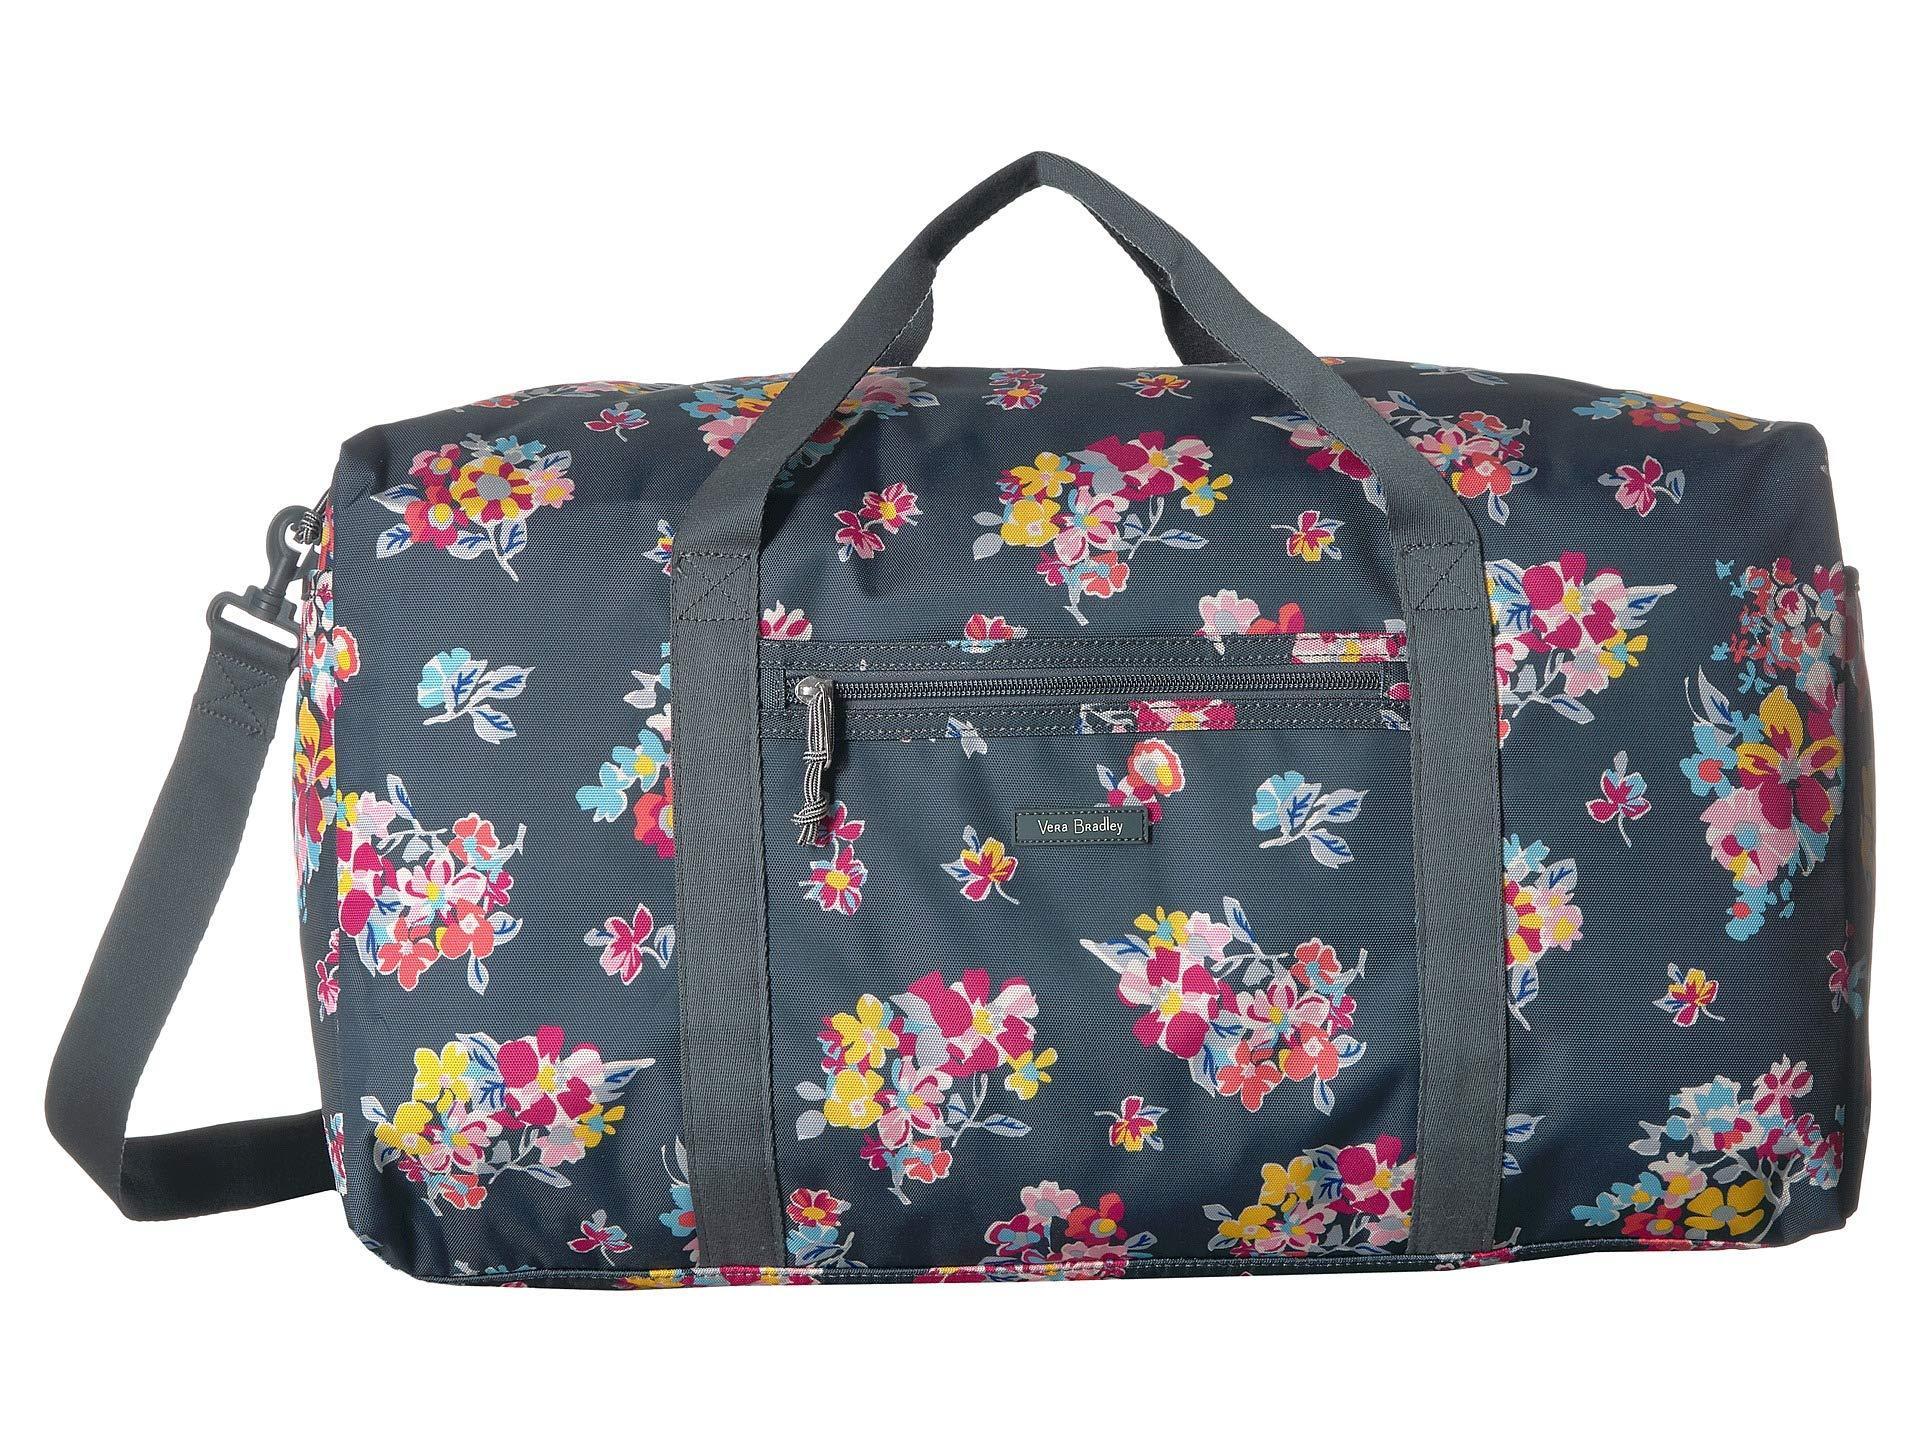 e60a3c40c9 Vera Bradley - Blue Lighten Up Large Travel Duffel (tossed Posies) Duffel  Bags -. View fullscreen